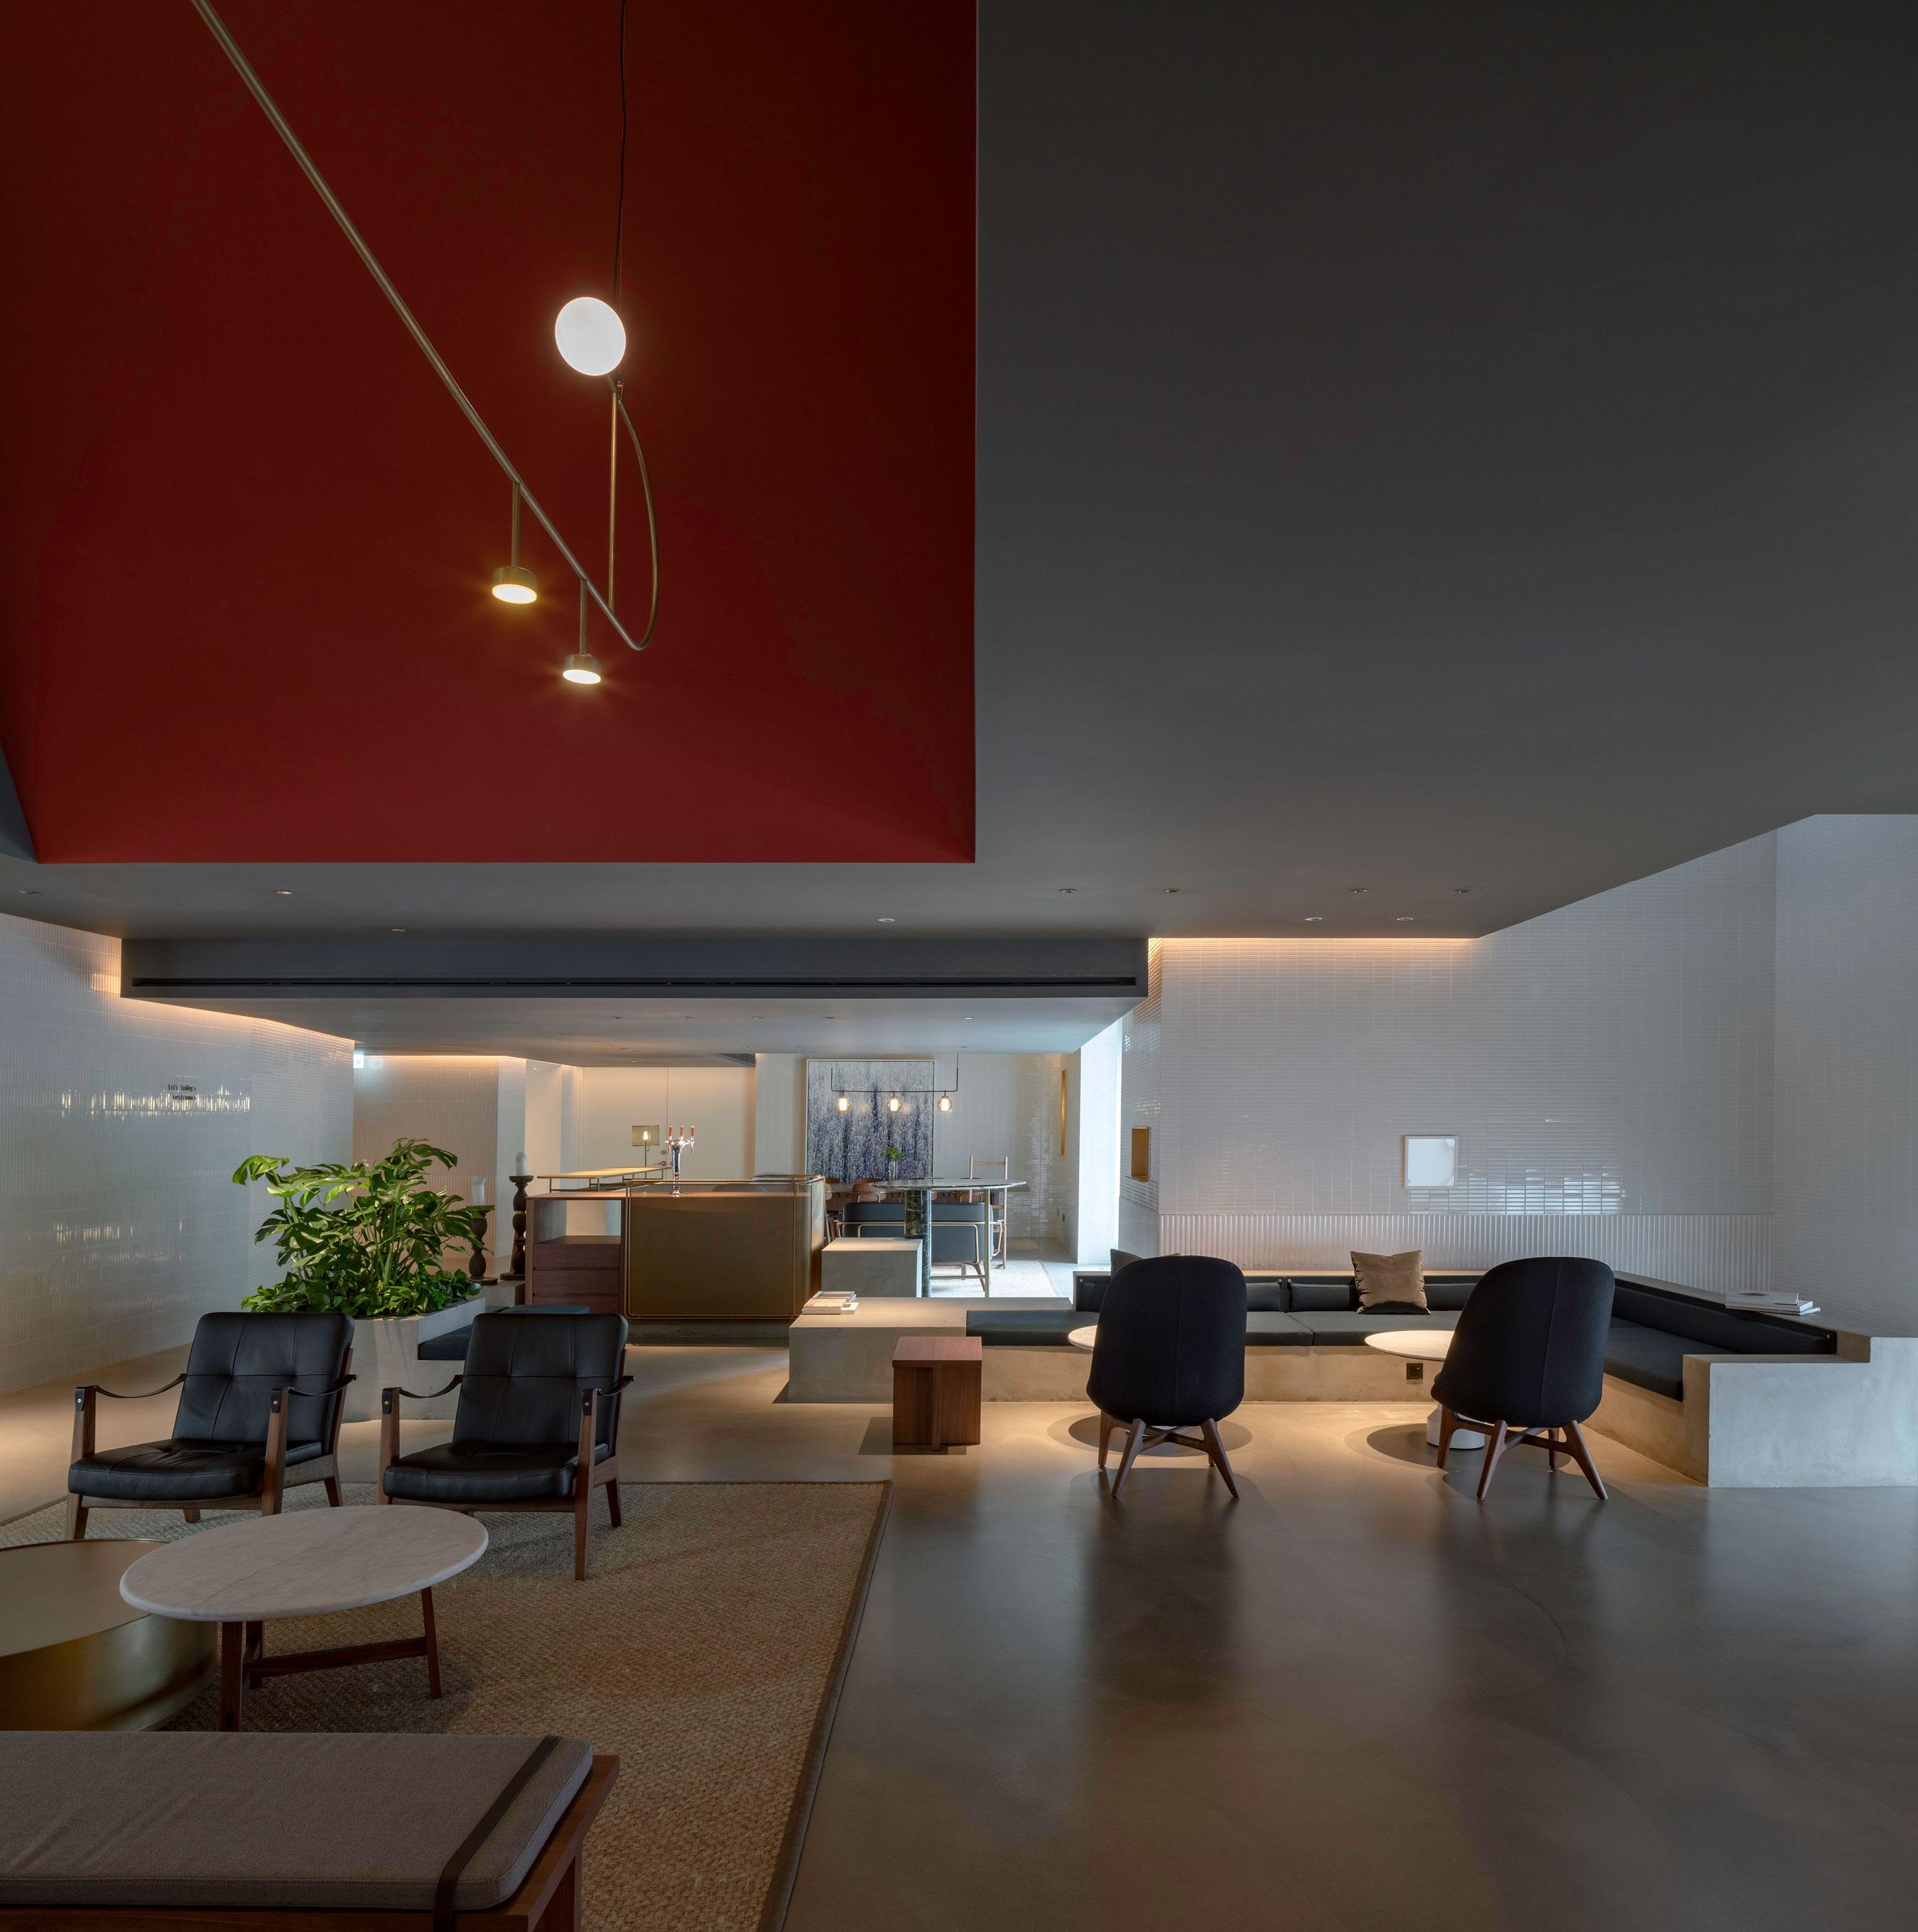 Kimpton Da An Hotel Designed by Neri&Hu Pedro Pegenaute